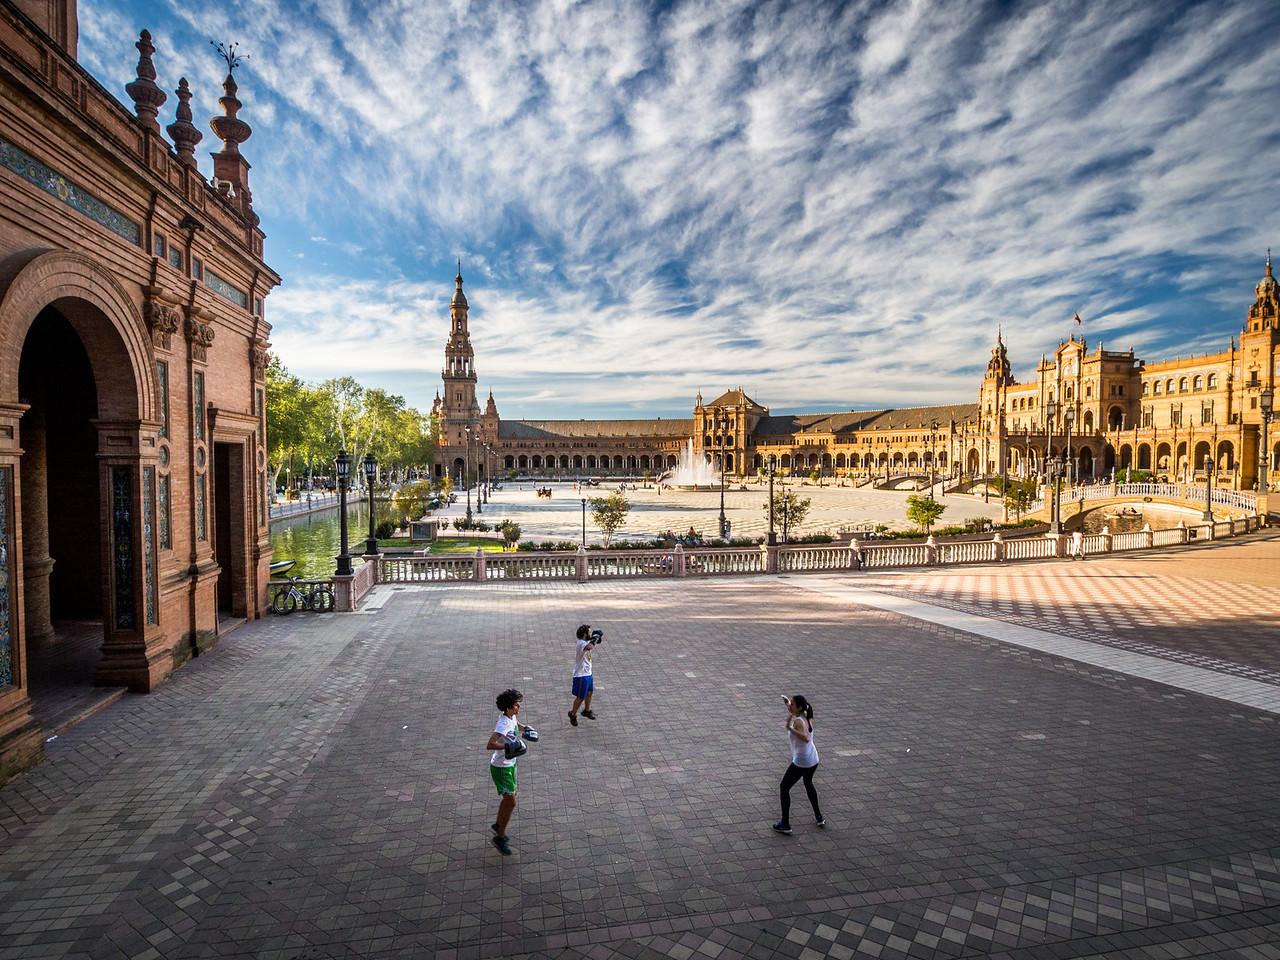 Kickboxing on the Plaza de España, Seville, Spain